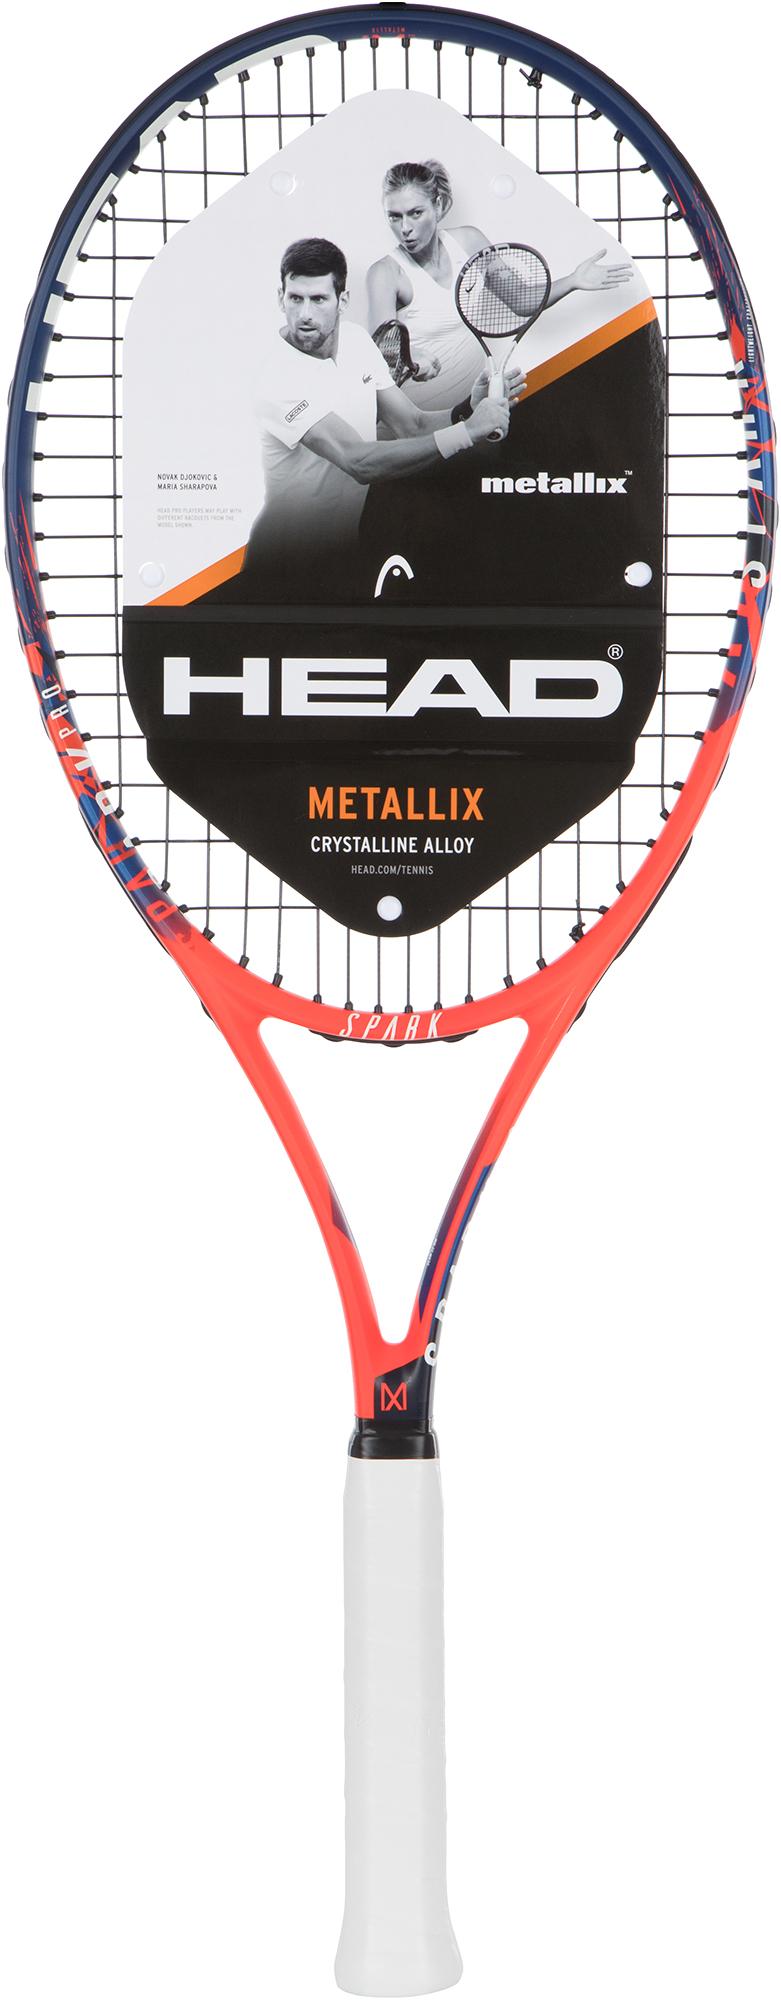 Head Ракетка для большого тенниса Head MX Spark Pro 27 head ракетка для большого тенниса head graphene 360 speed lite 27